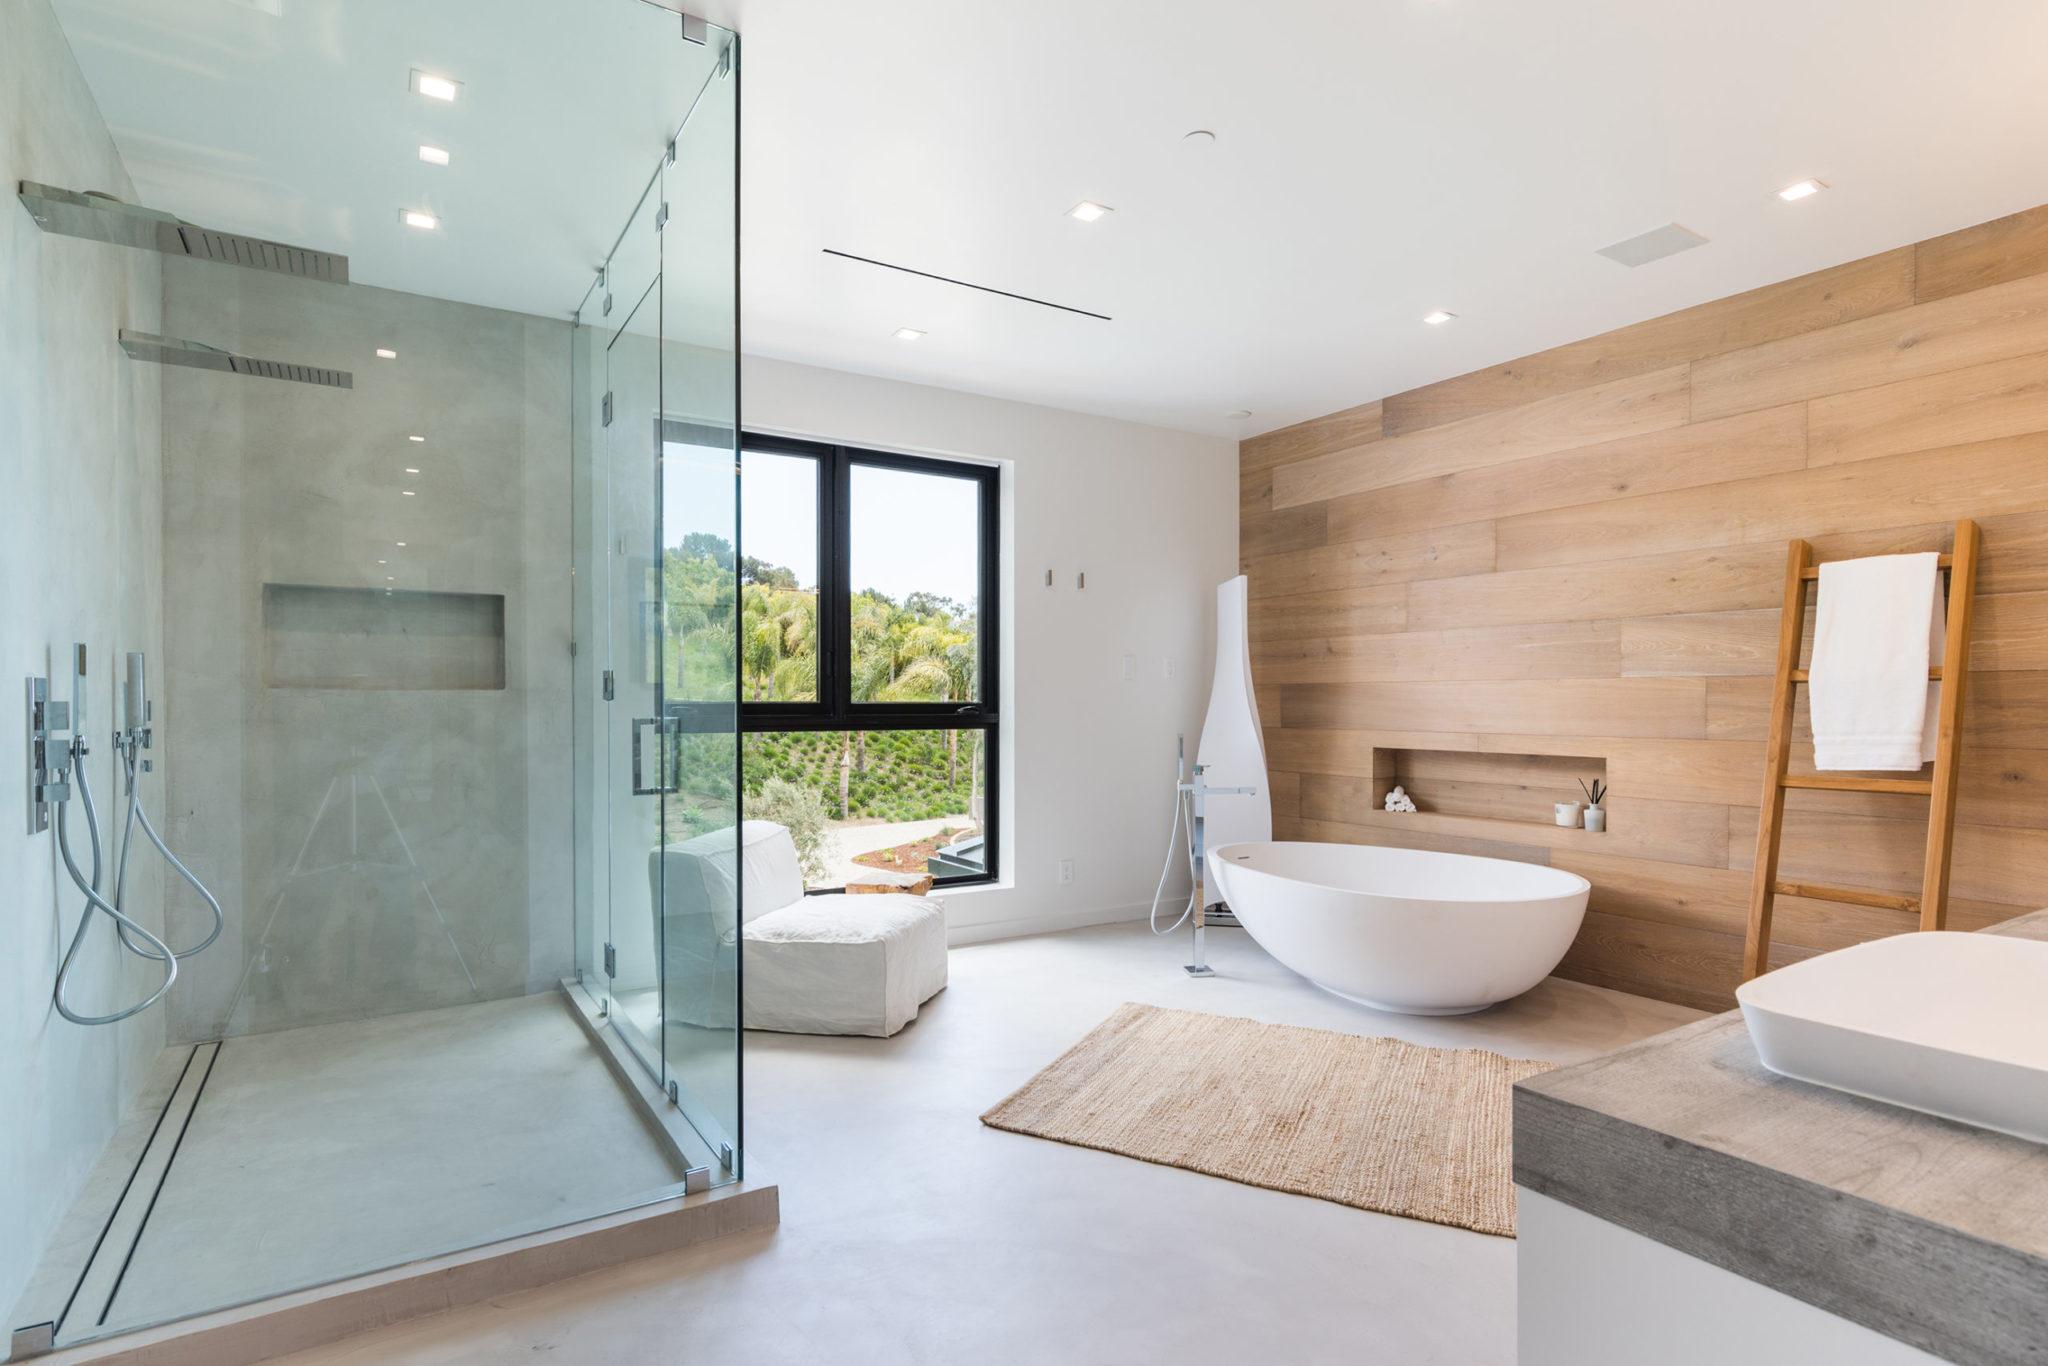 Arredo bagno,mobili bagno,mobili bagno sospesi e a terra - GPF 7223 Edit scaled e1627290561141